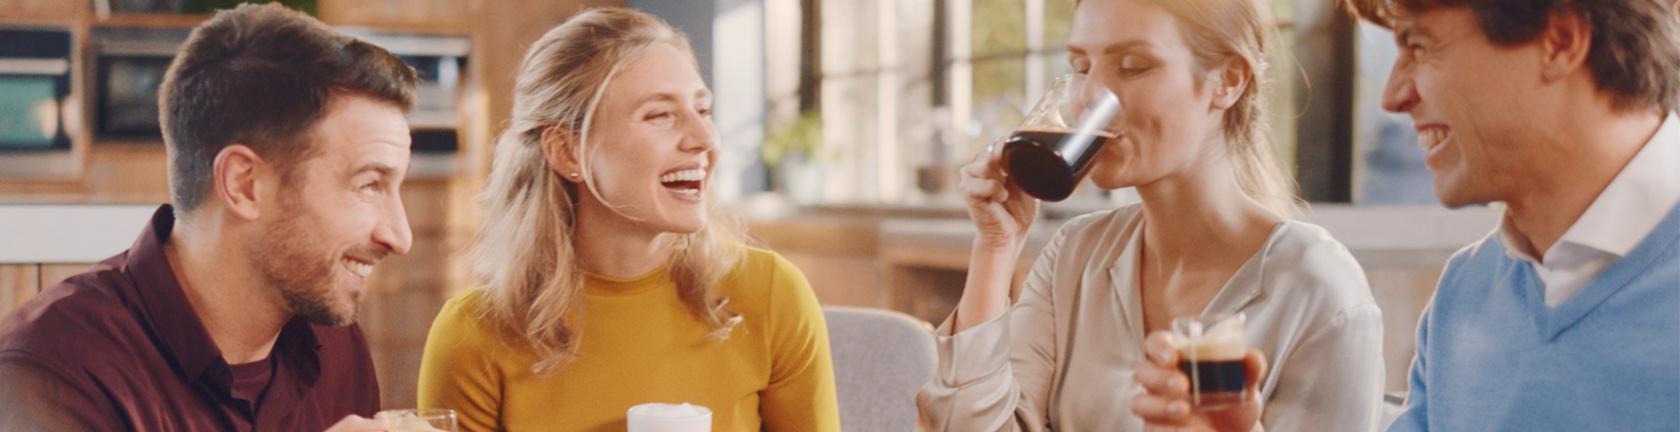 2 mannen en 2 vrouwen, drinken koffie, lachen en genieten